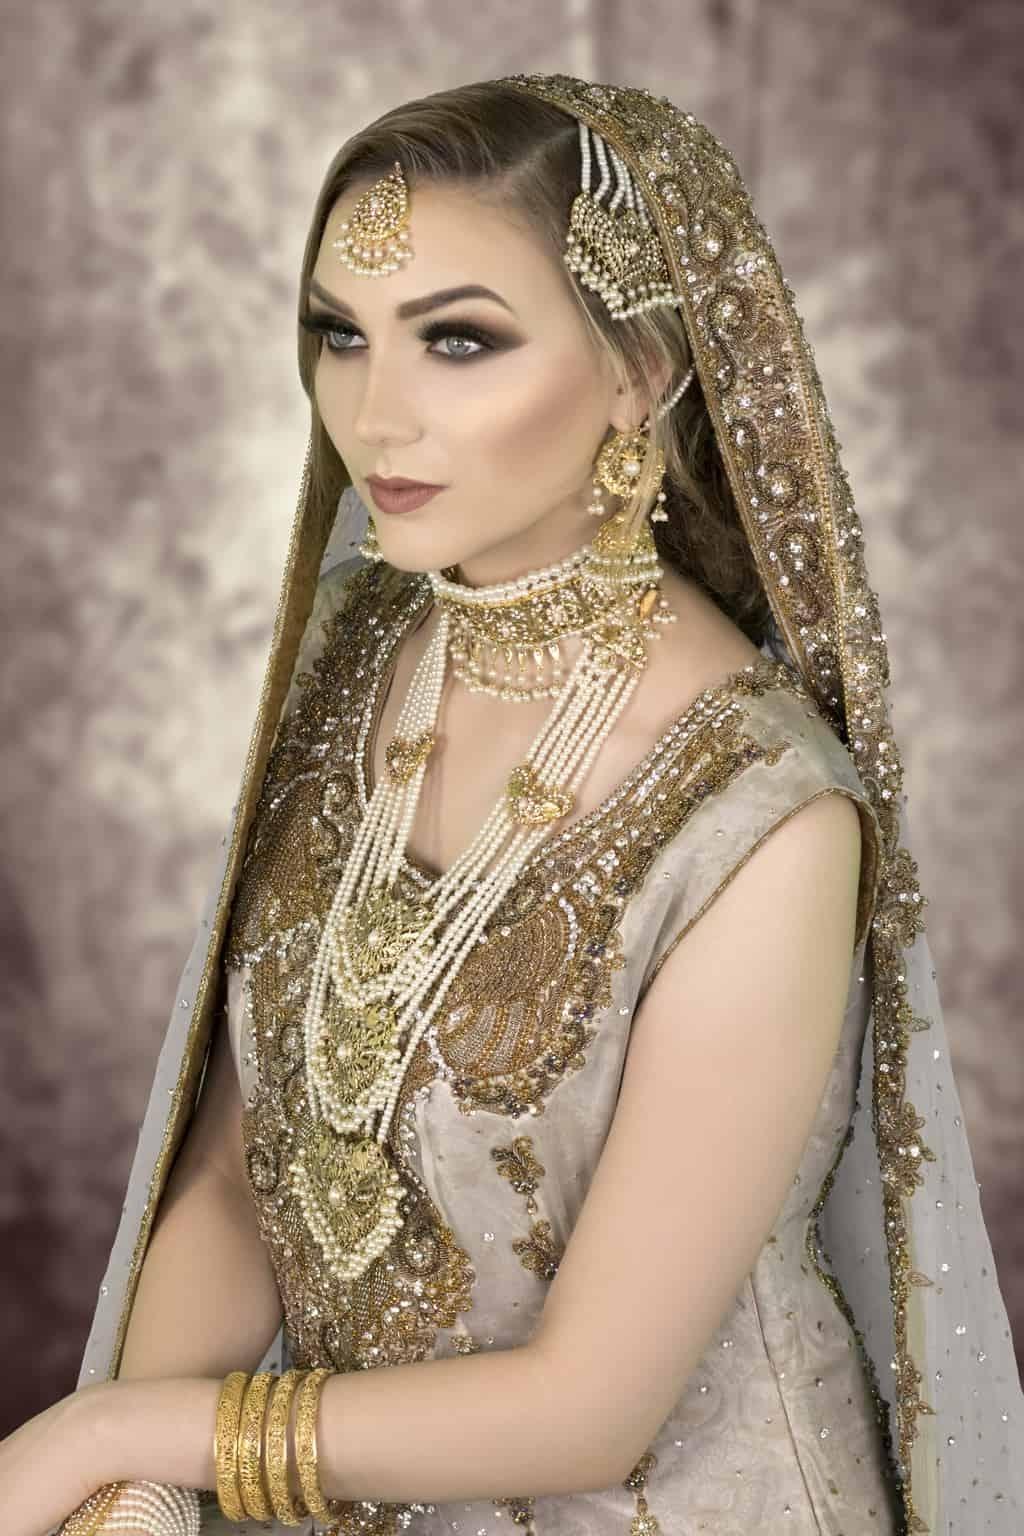 Bridal Hair And Makeup - Master Asian Bridal Makeup Artist And regarding The most ideal Asian Bridal Hairstyles 2018